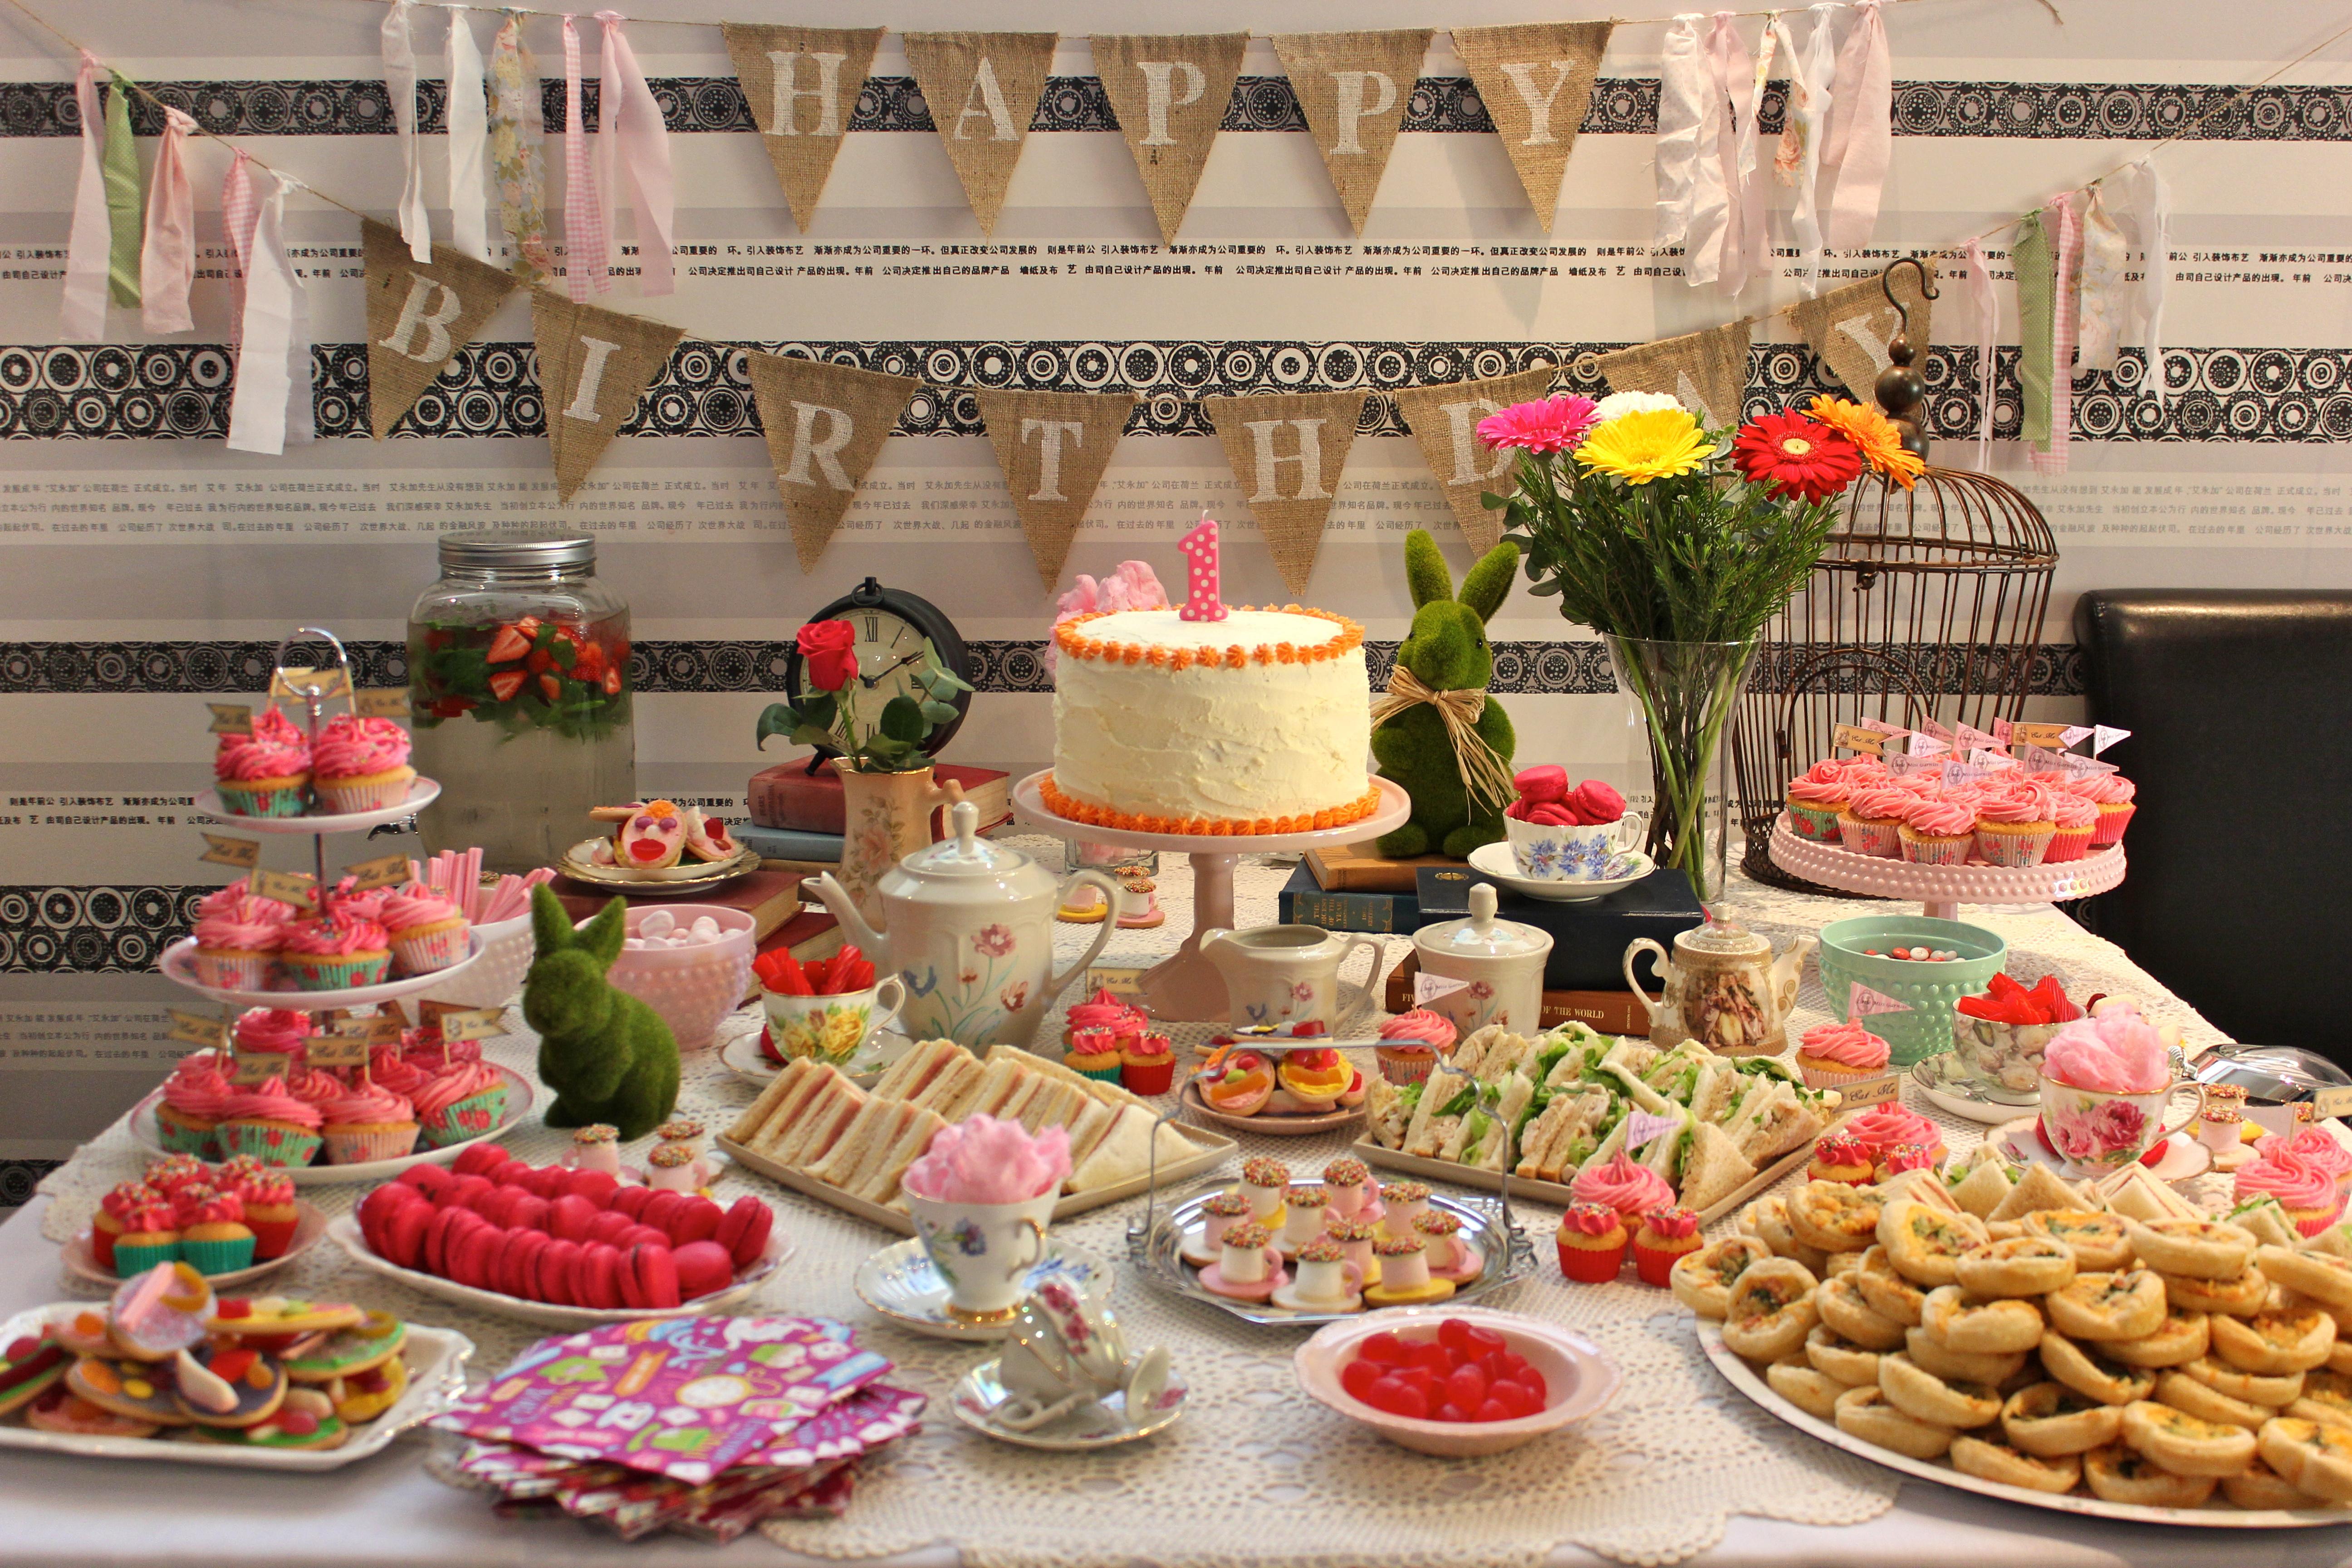 Alison in Wonderland Vintage Tea Birthday Party